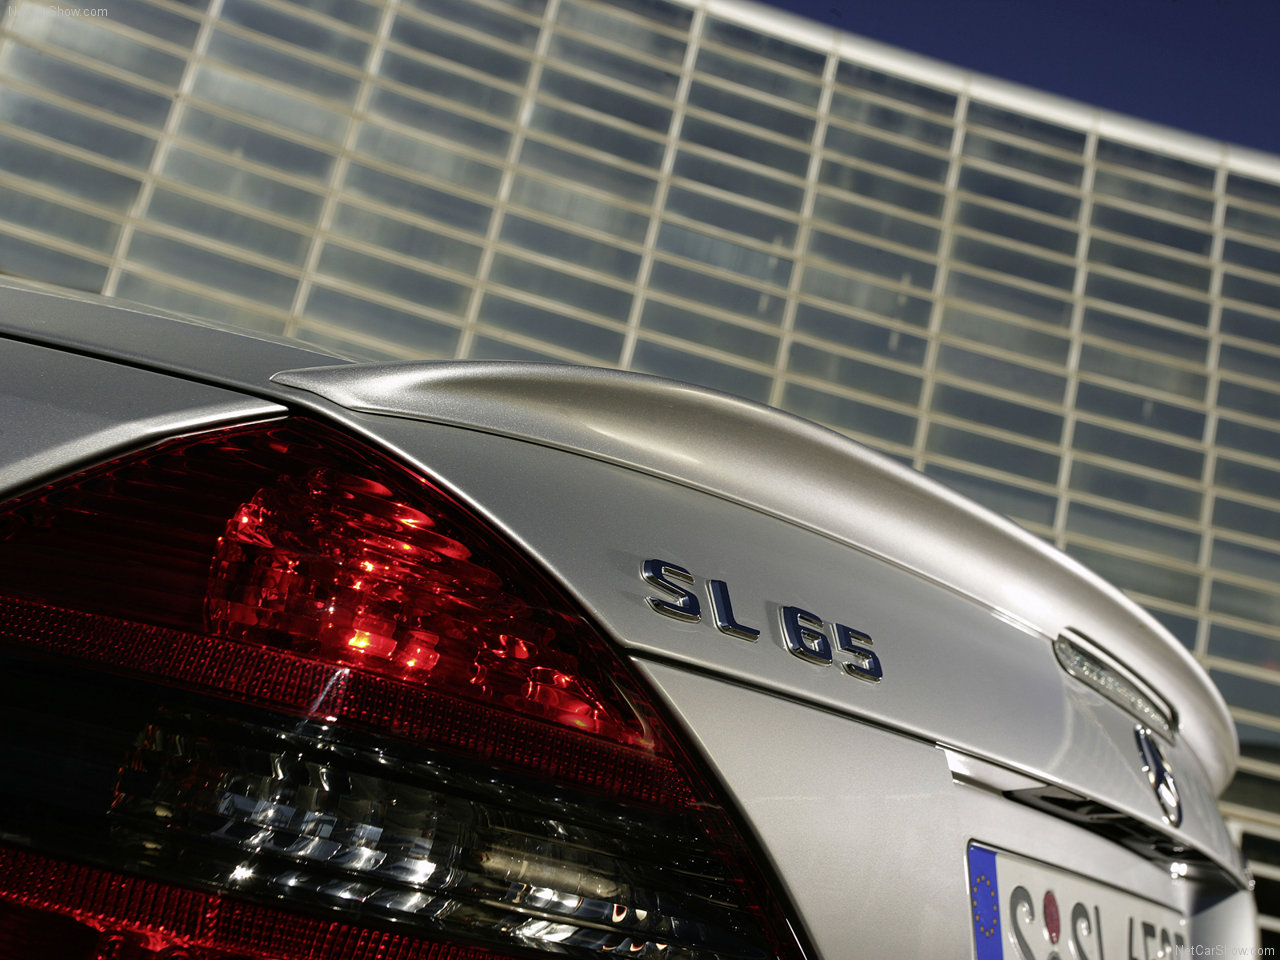 http://2.bp.blogspot.com/_3V1YR3u6VBg/S8ScEv7NuUI/AAAAAAAAB8k/N1-SVAvmJ9g/s1600/Mercedes-Benz-SL65_AMG_2009_1280x960_wallpaper_2d.jpg